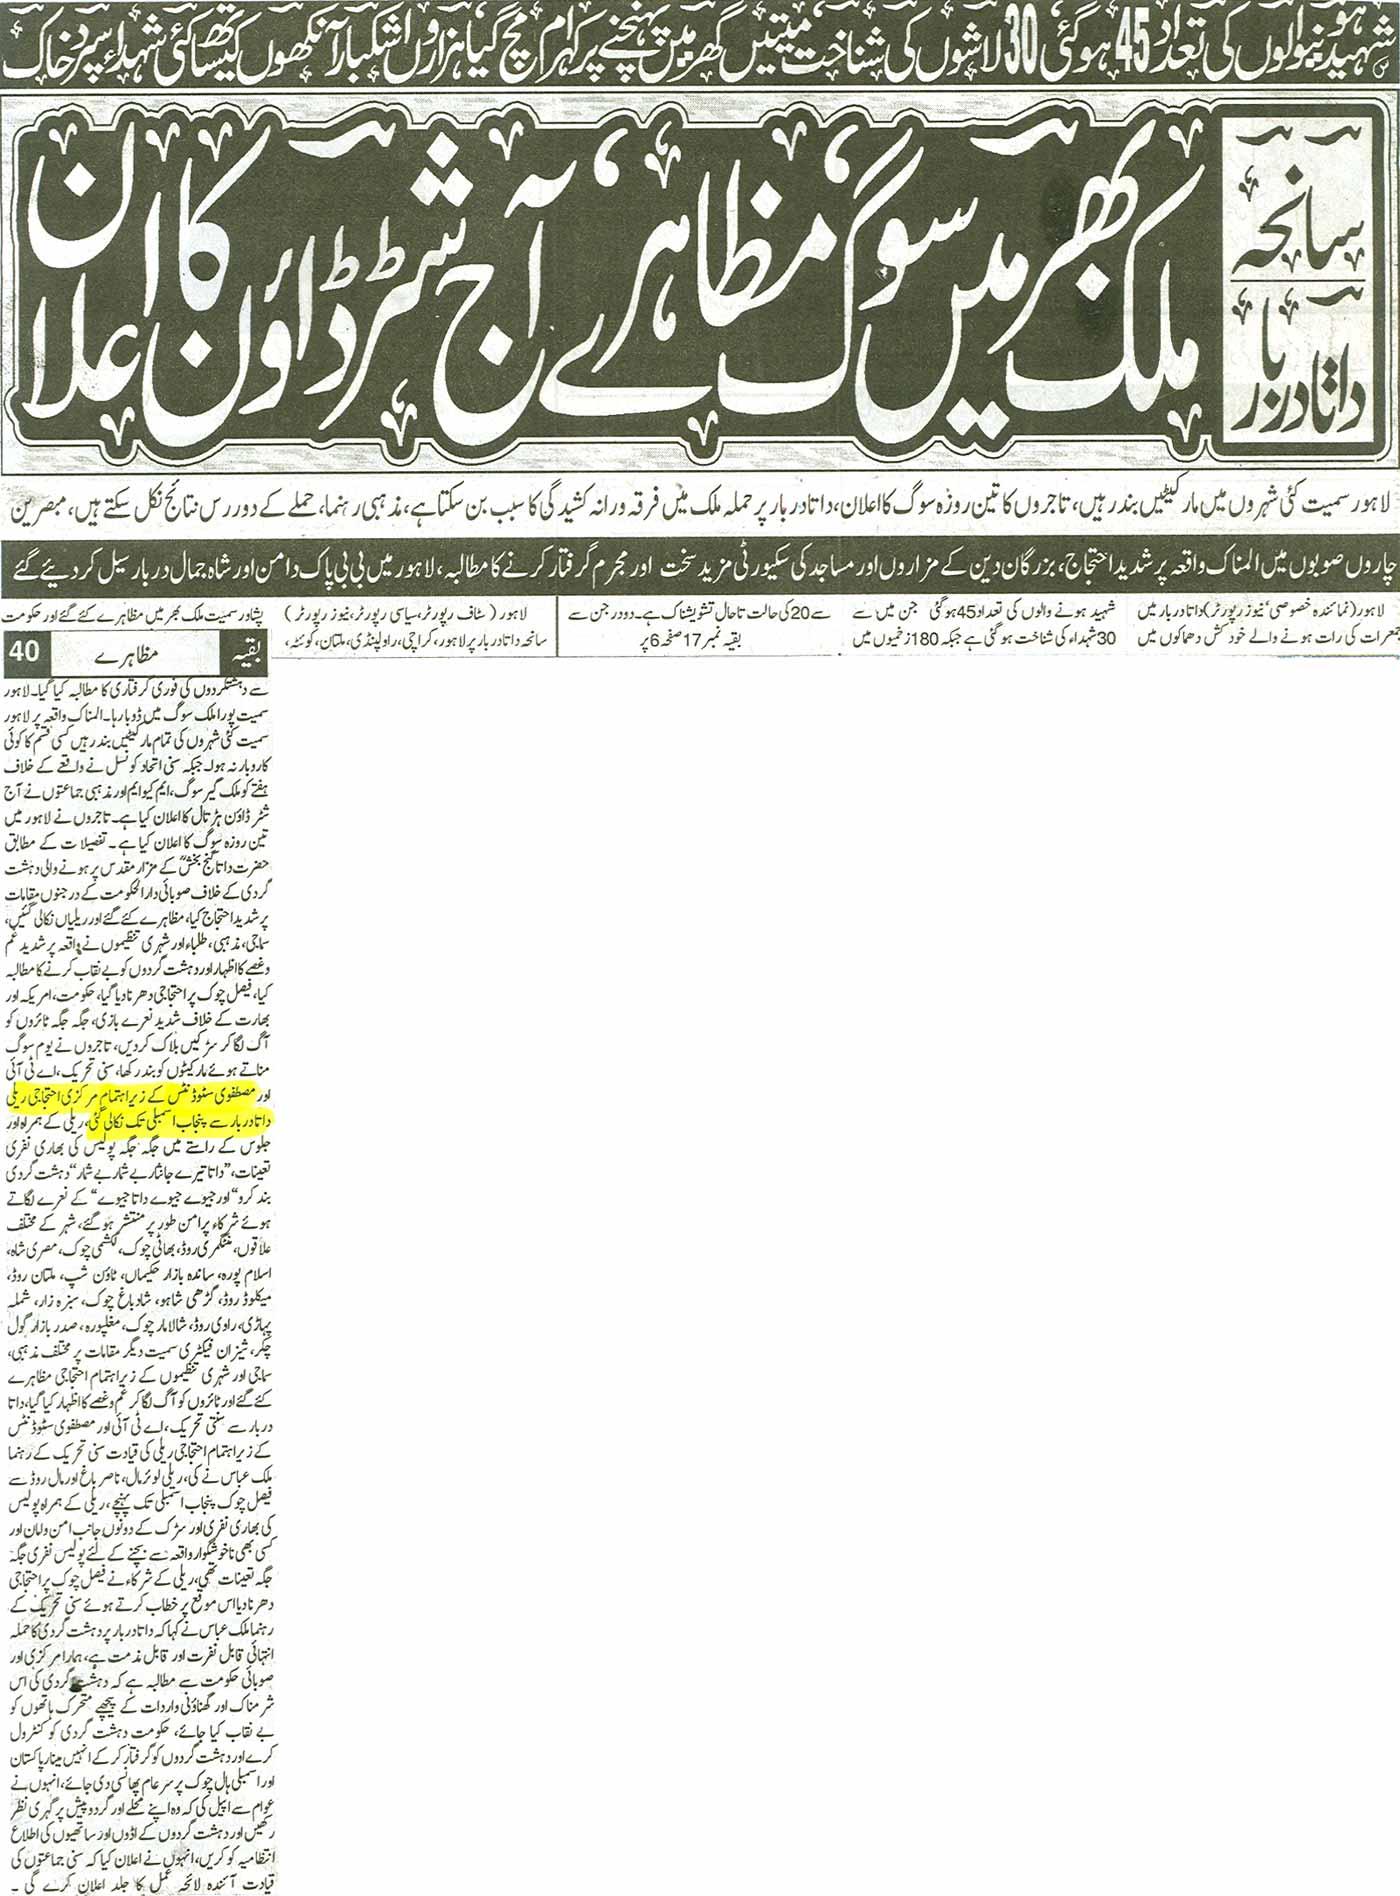 Minhaj-ul-Quran  Print Media Coverage Daily Din Front Page